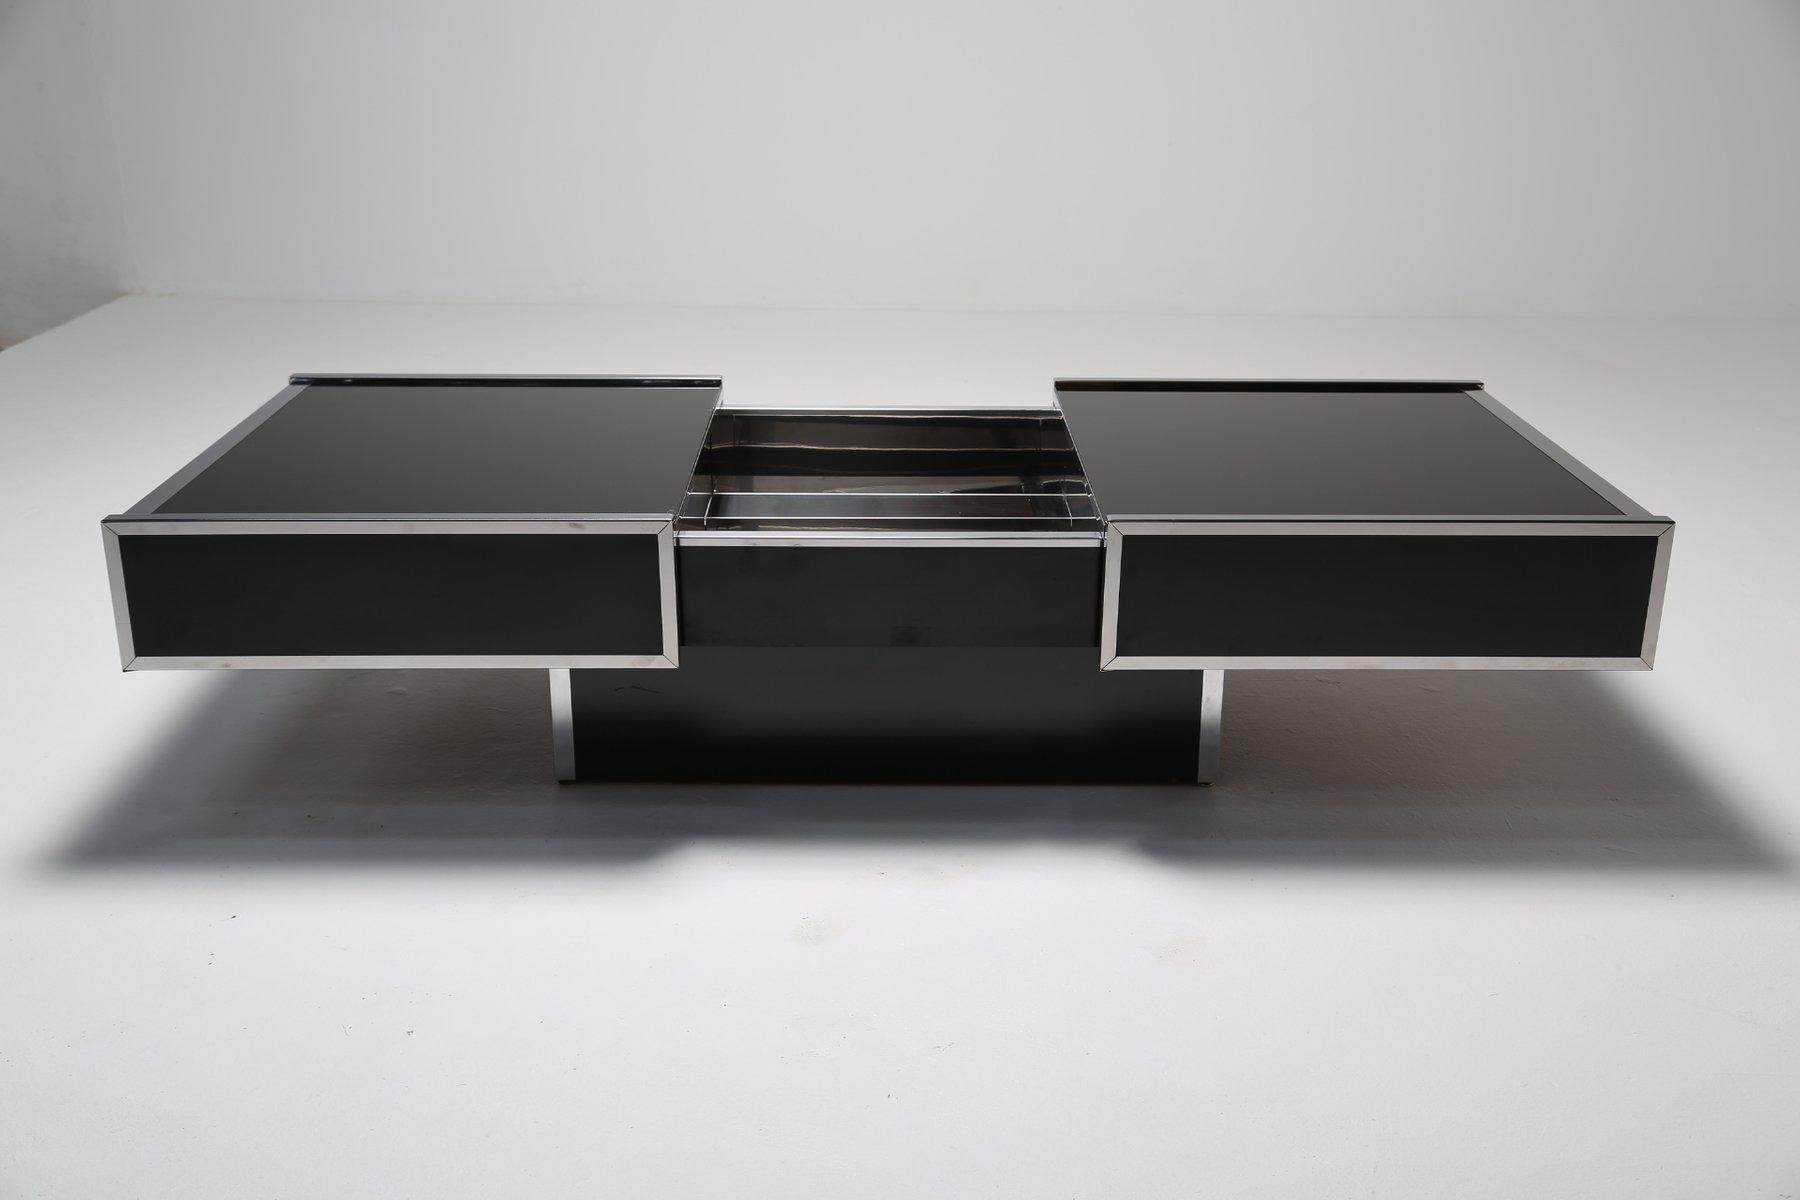 cocktail-or-coffee-table-with-internal-bar-from-maison-lancel-4 Frais De Meuble Bar Merisier Concept